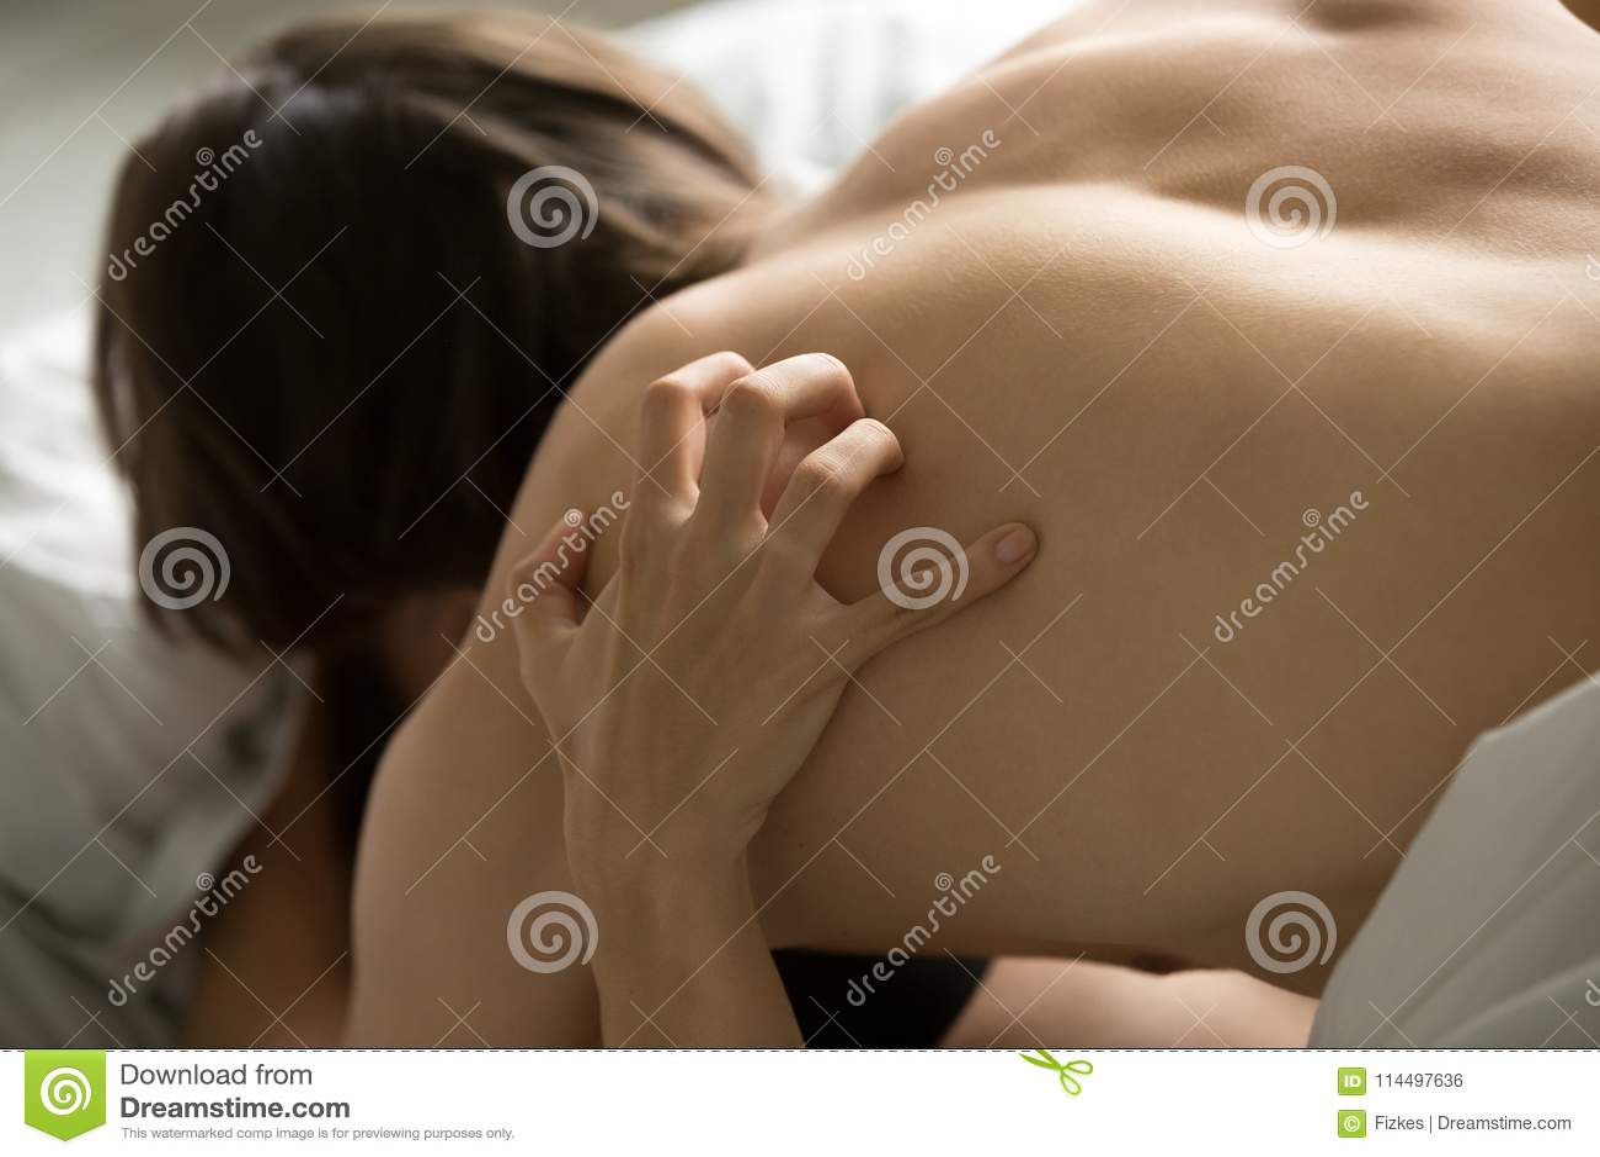 Orgasme féminin secouant